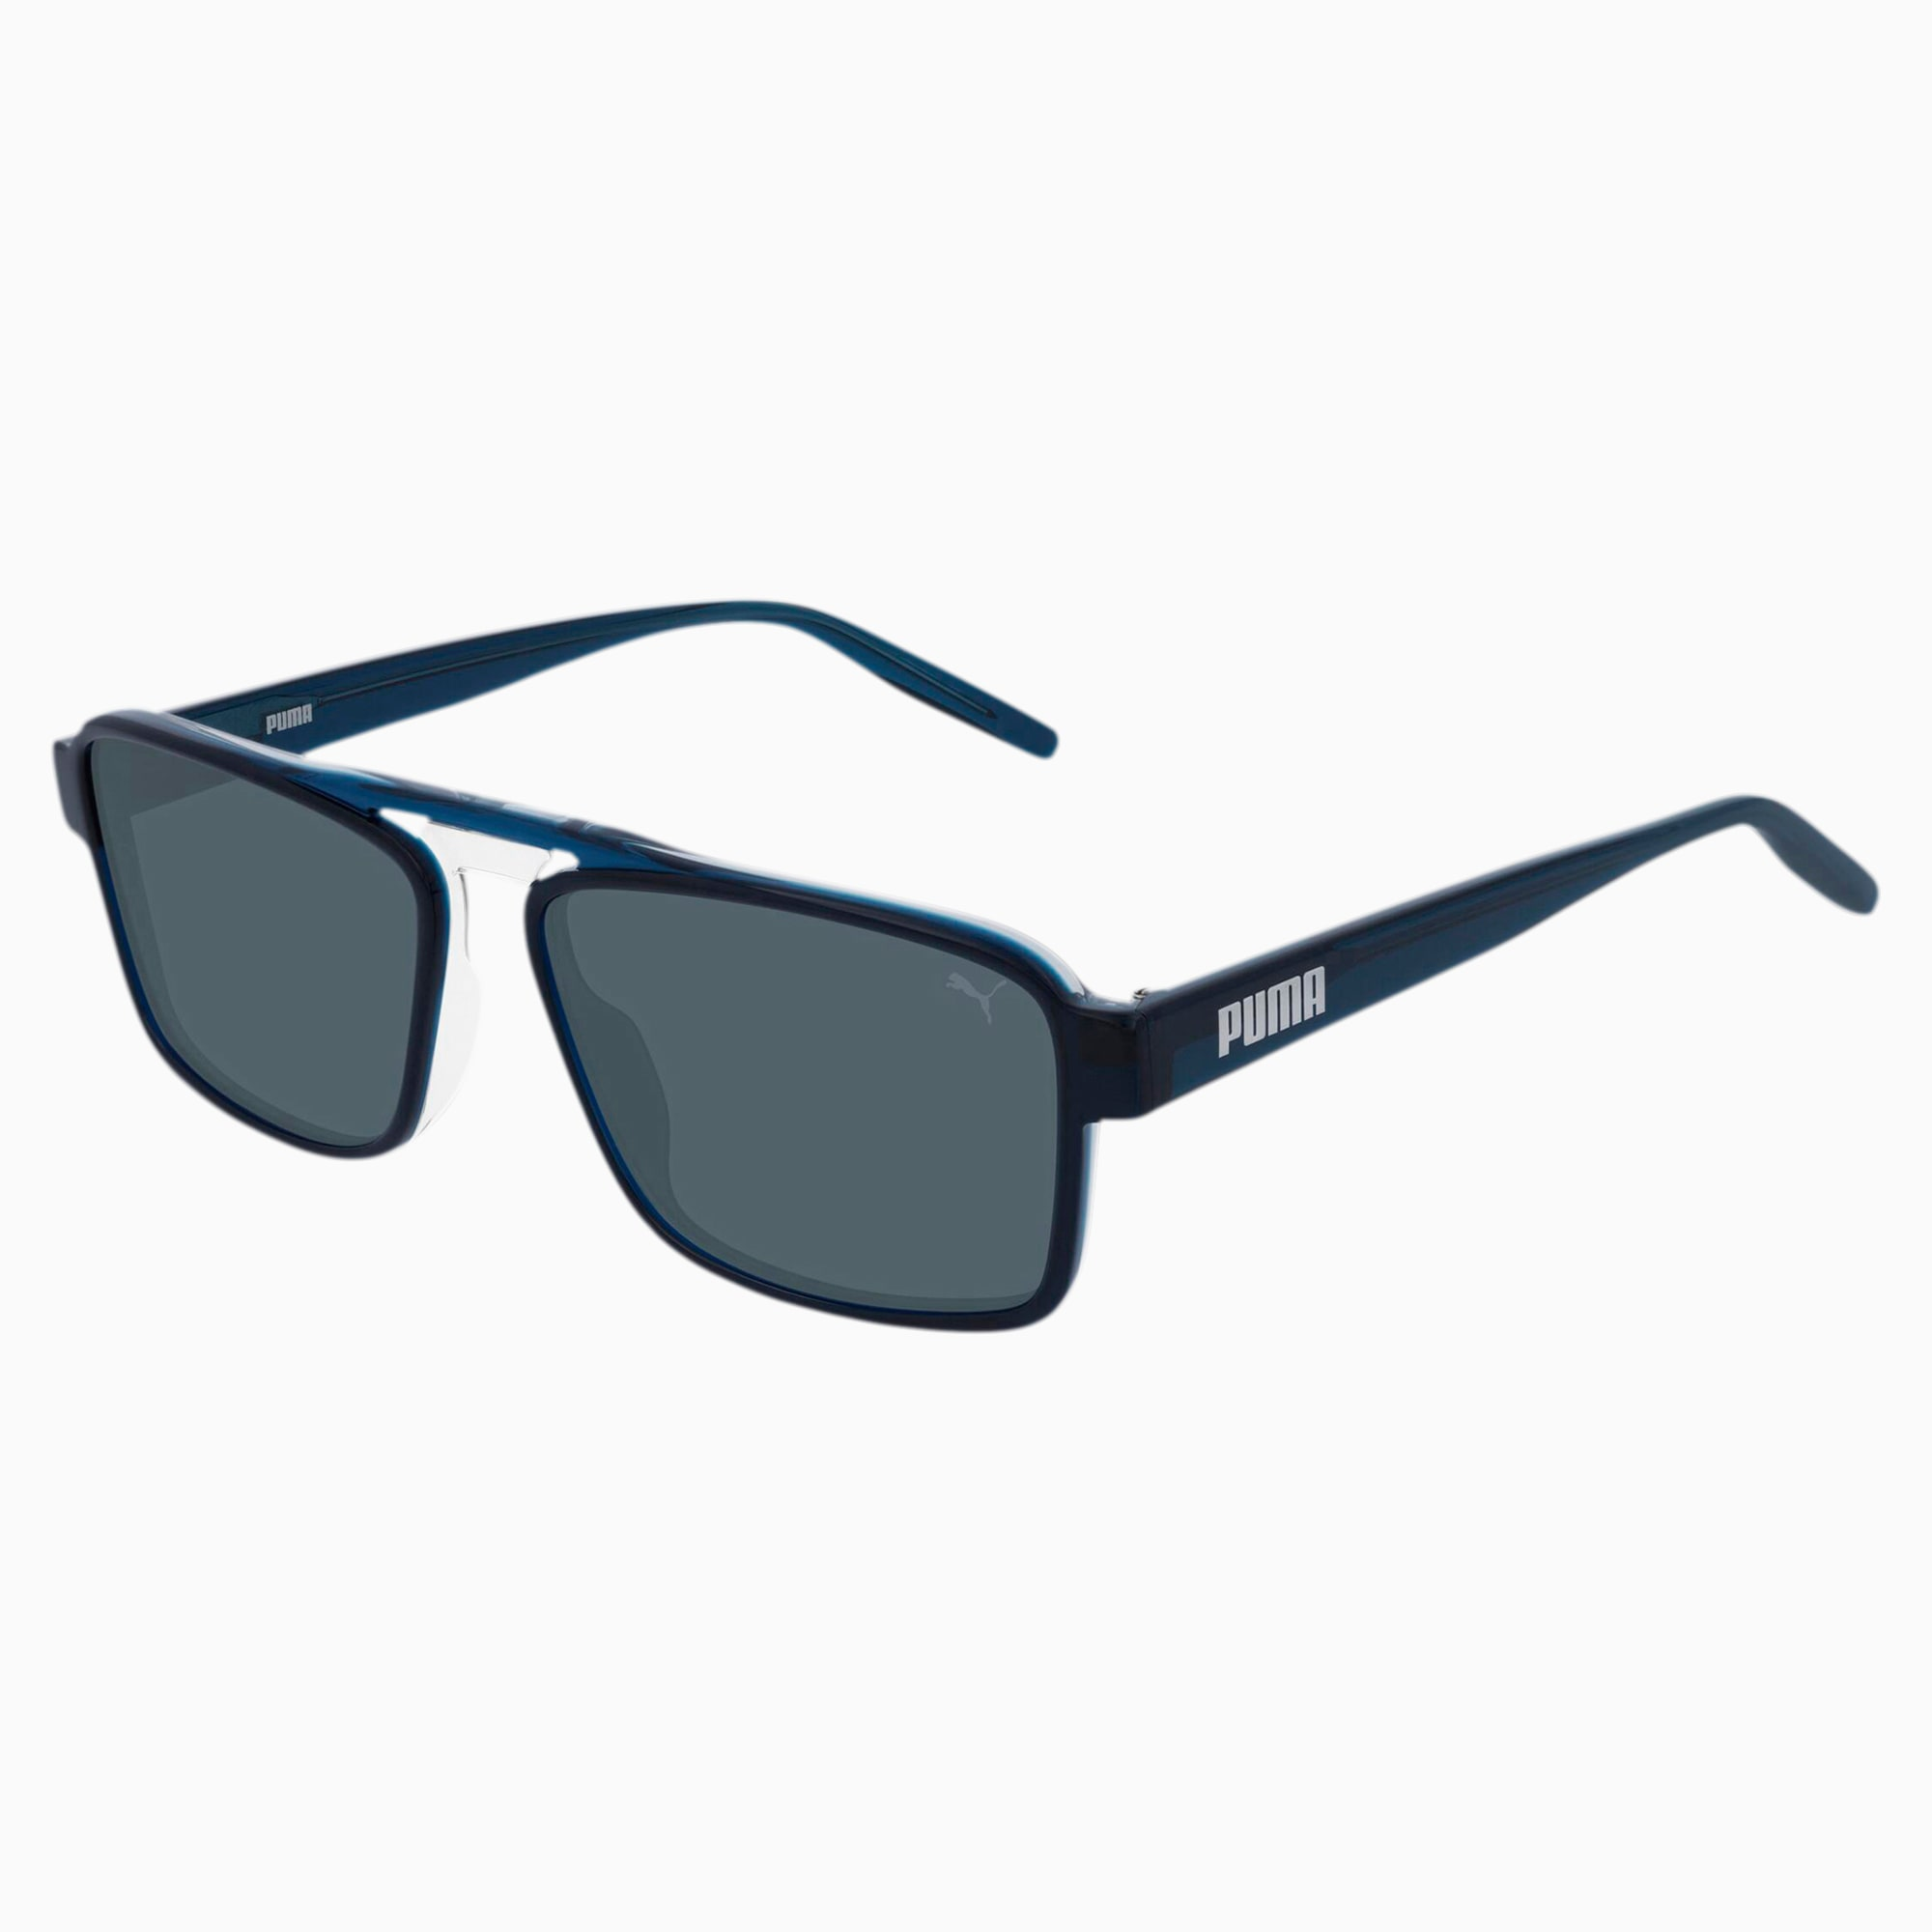 Sonnenbrille Hybrid v3 | PUMA Sunglasses | PUMA Deutschland